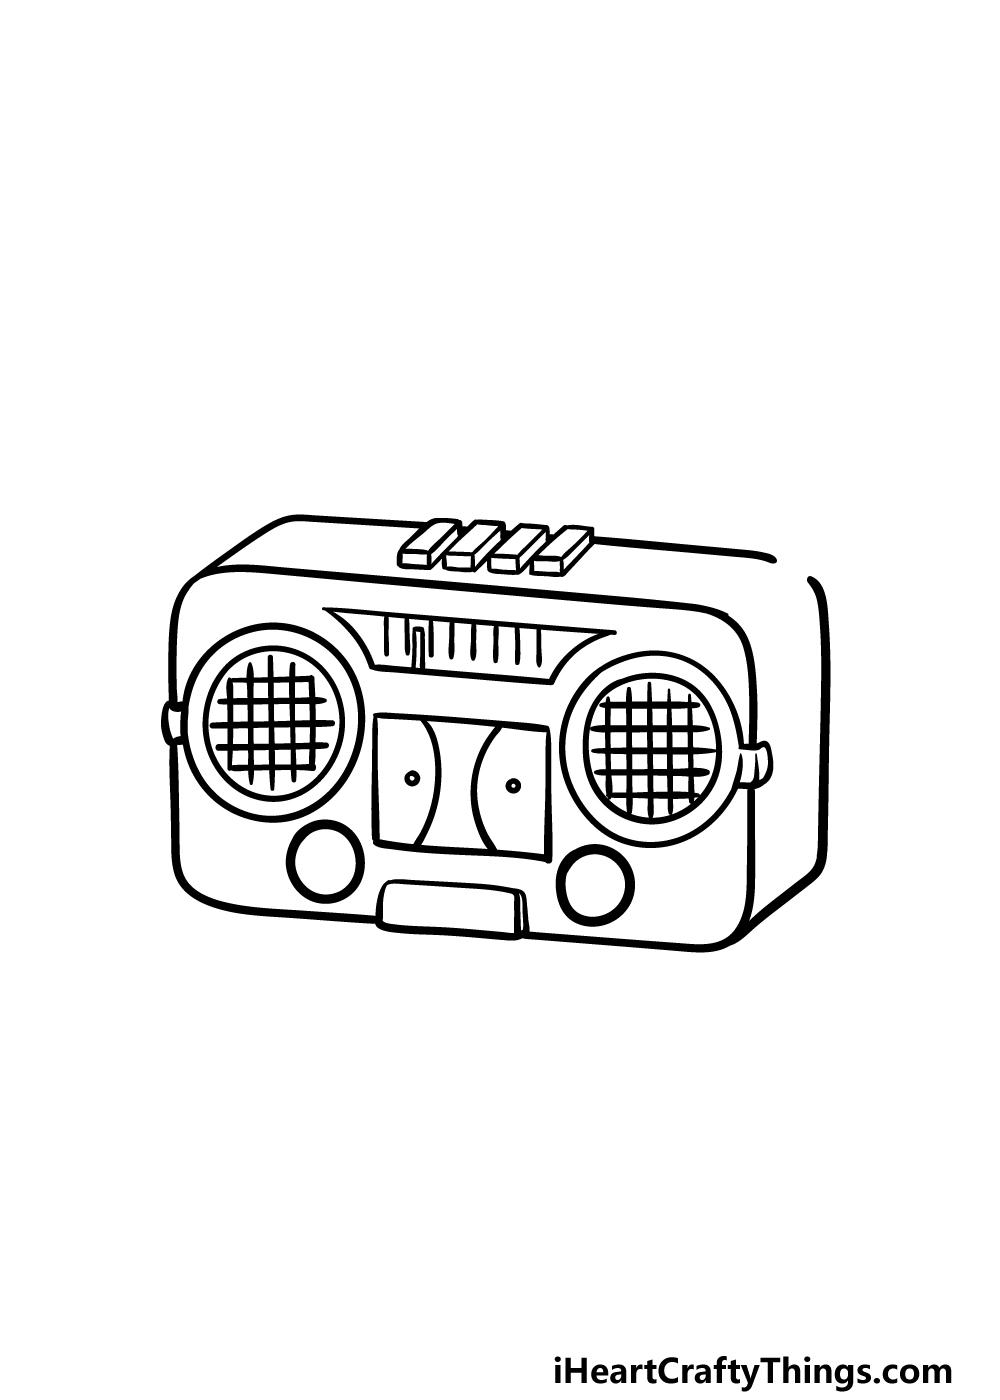 drawing a radio step 4